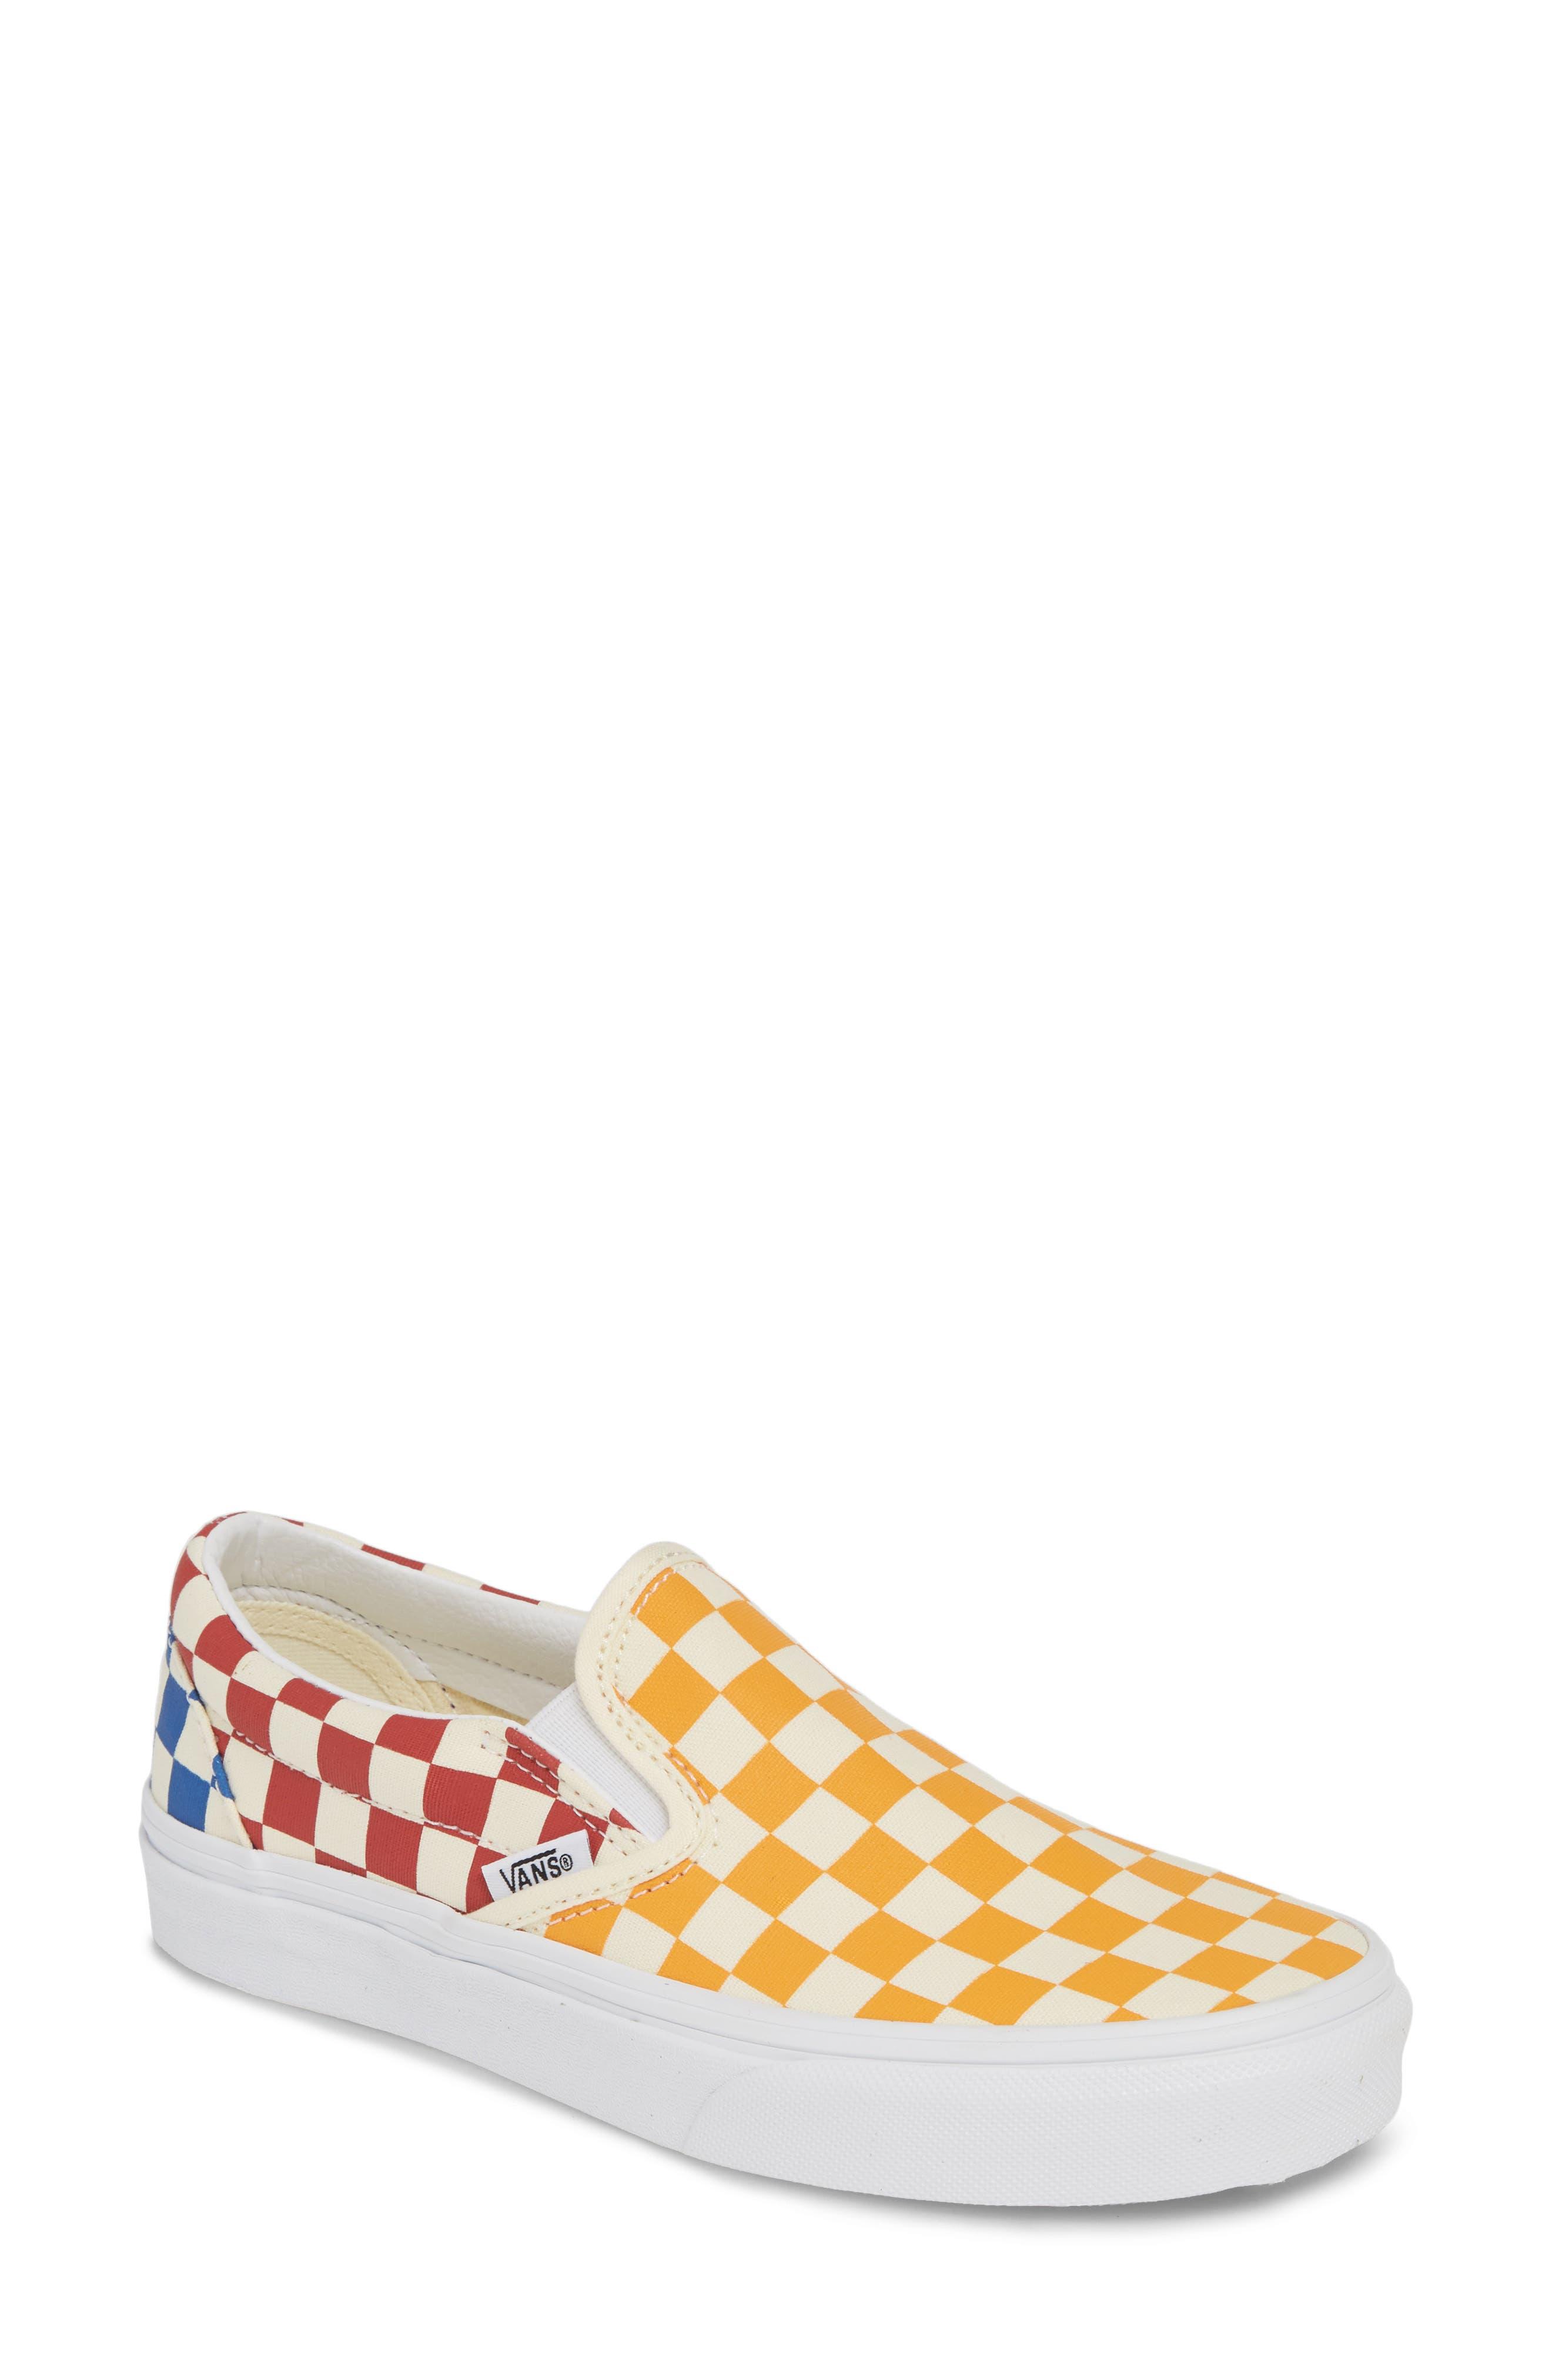 Vans Classic Slip-On Sneaker, Orange